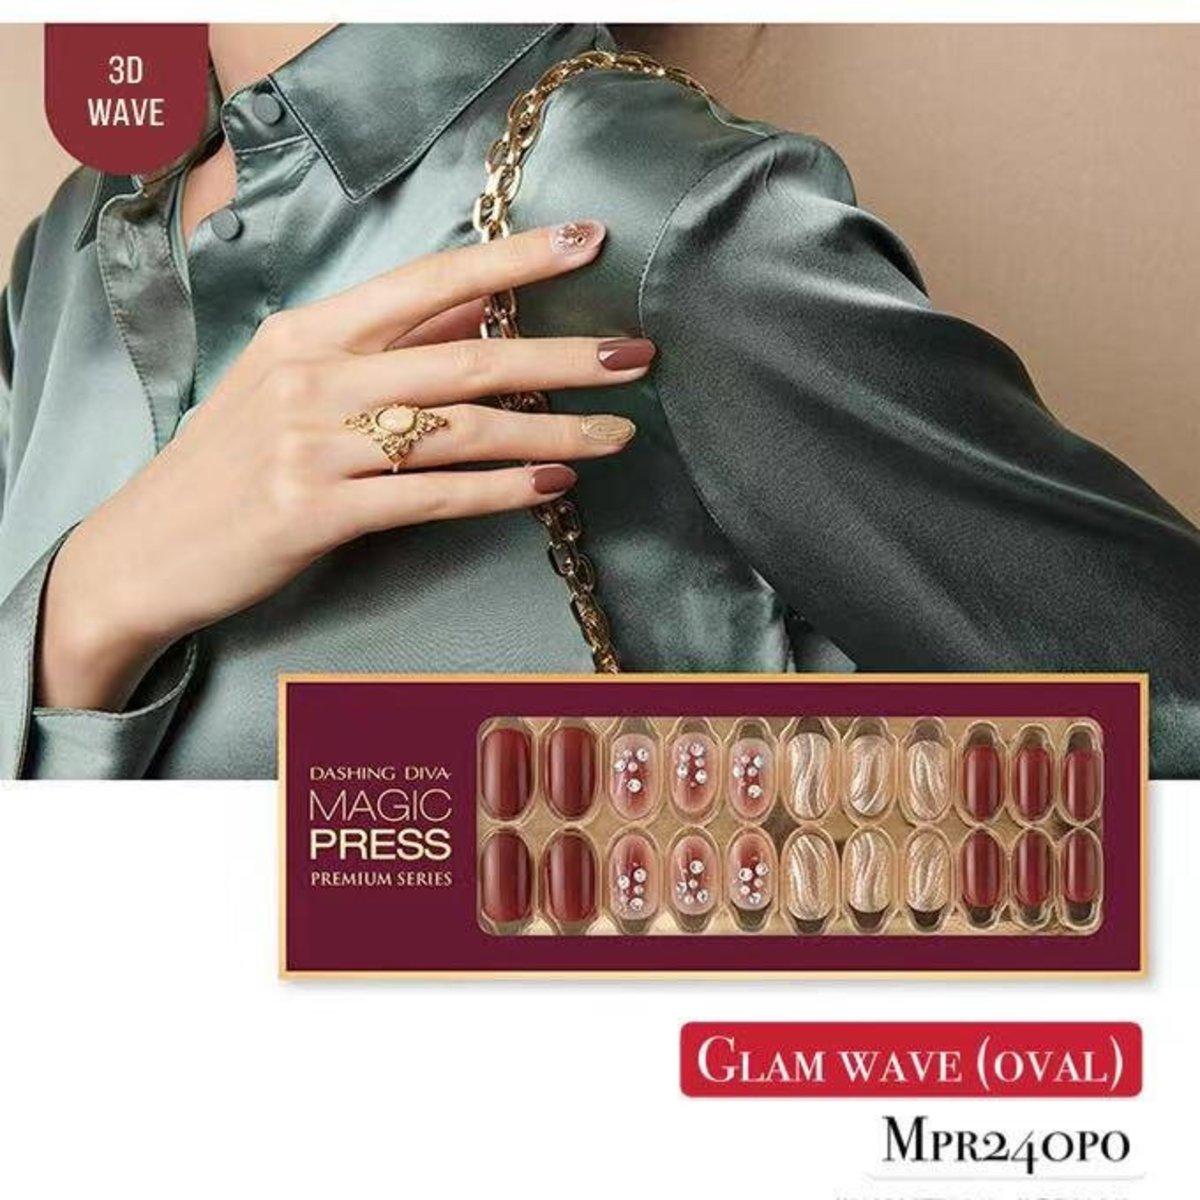 Magic Press MPR240PO Premium Super Slim Fit - Glam Move Collection (Limited Edition) Glam Wave (Oval)